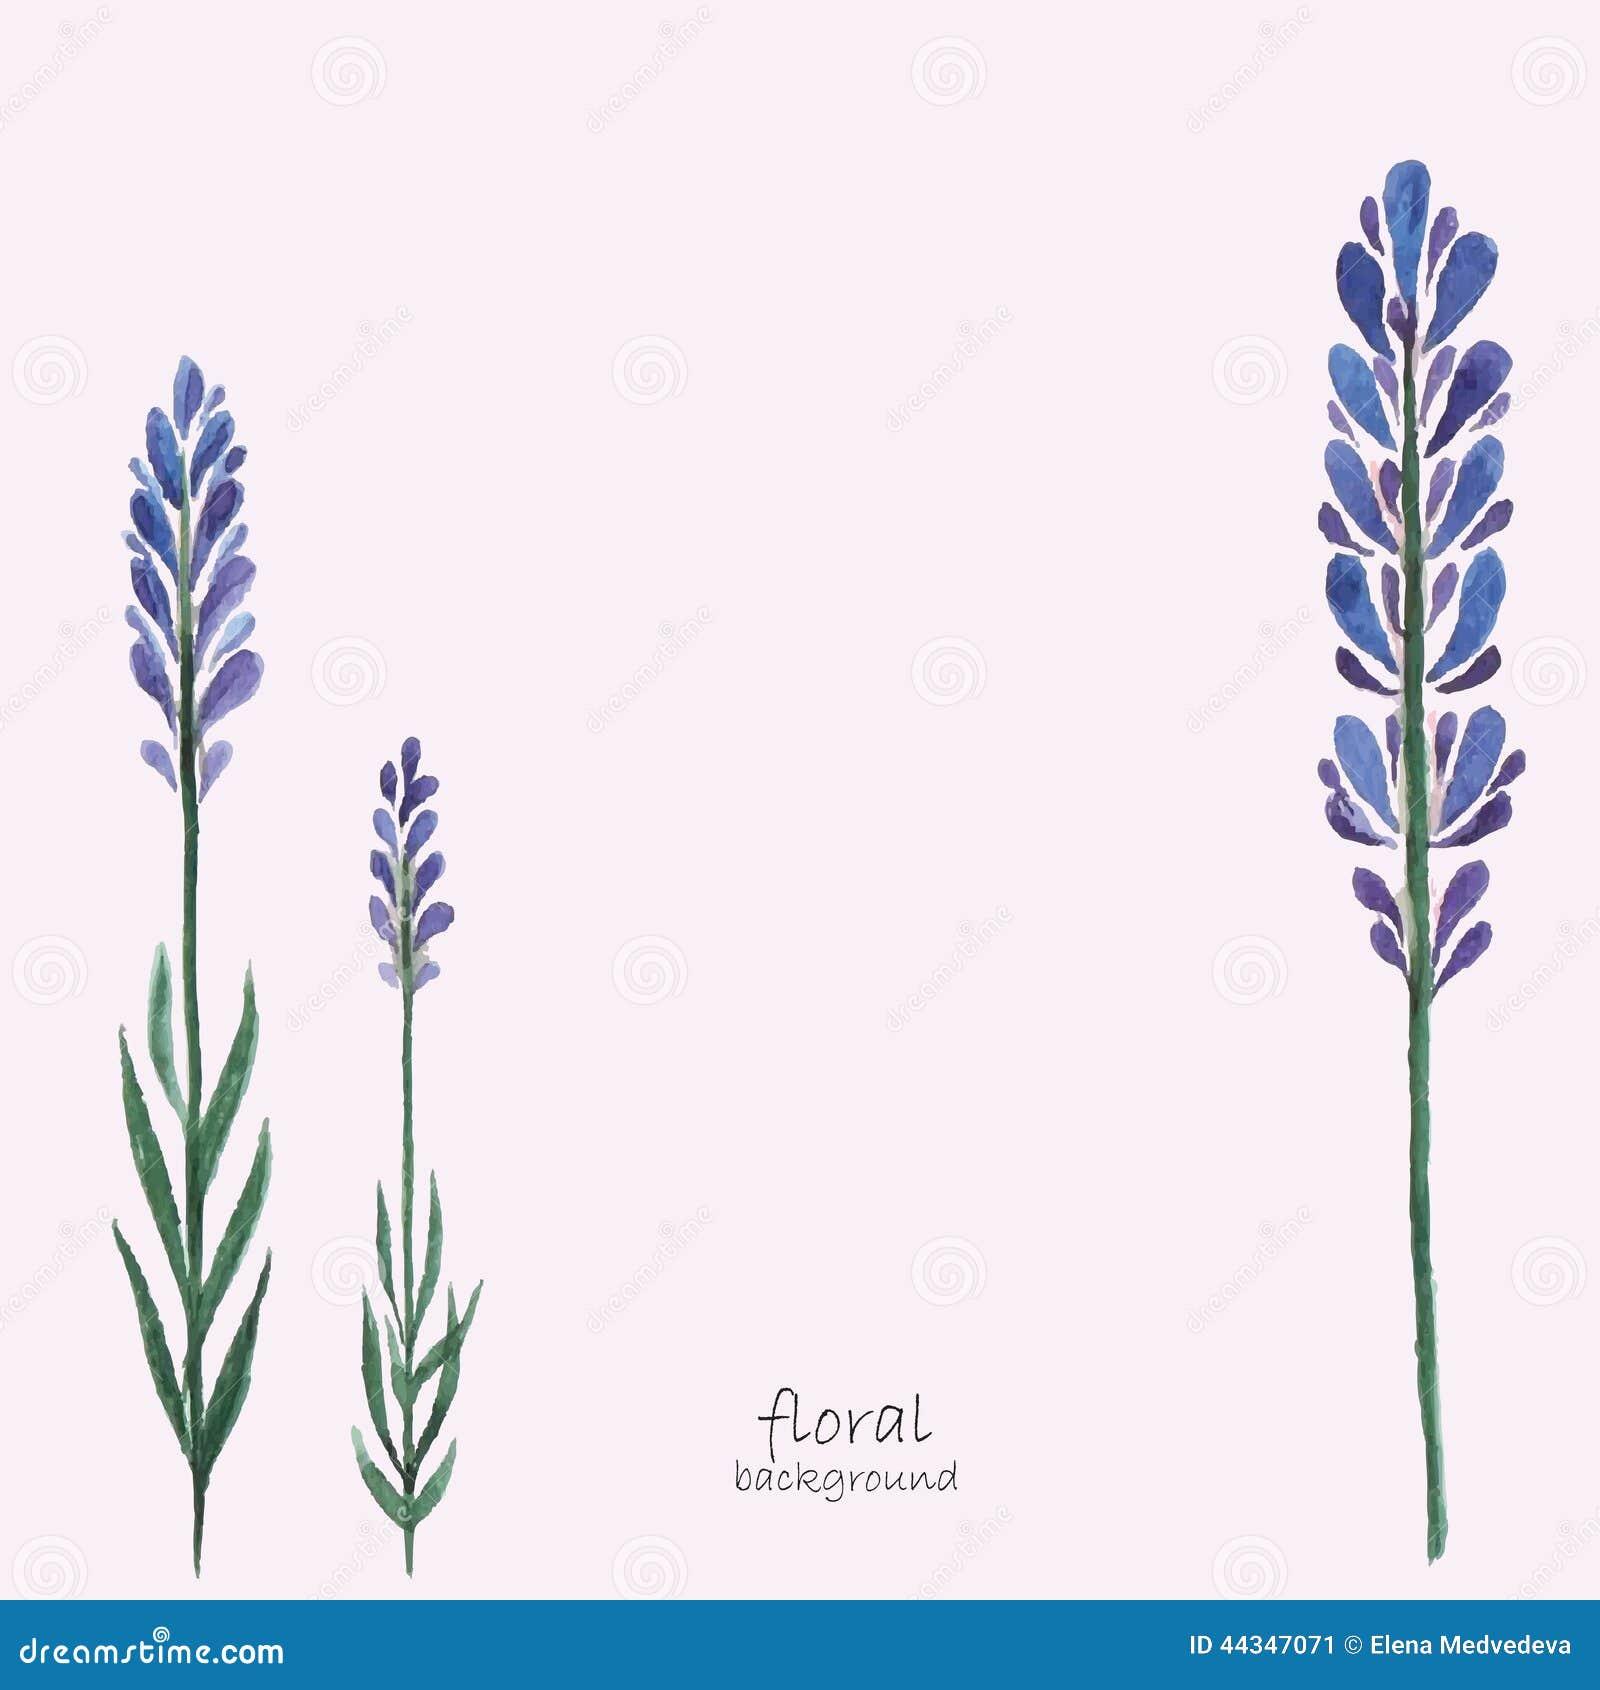 лаванда лаванда цветы цветы PNG изображение для